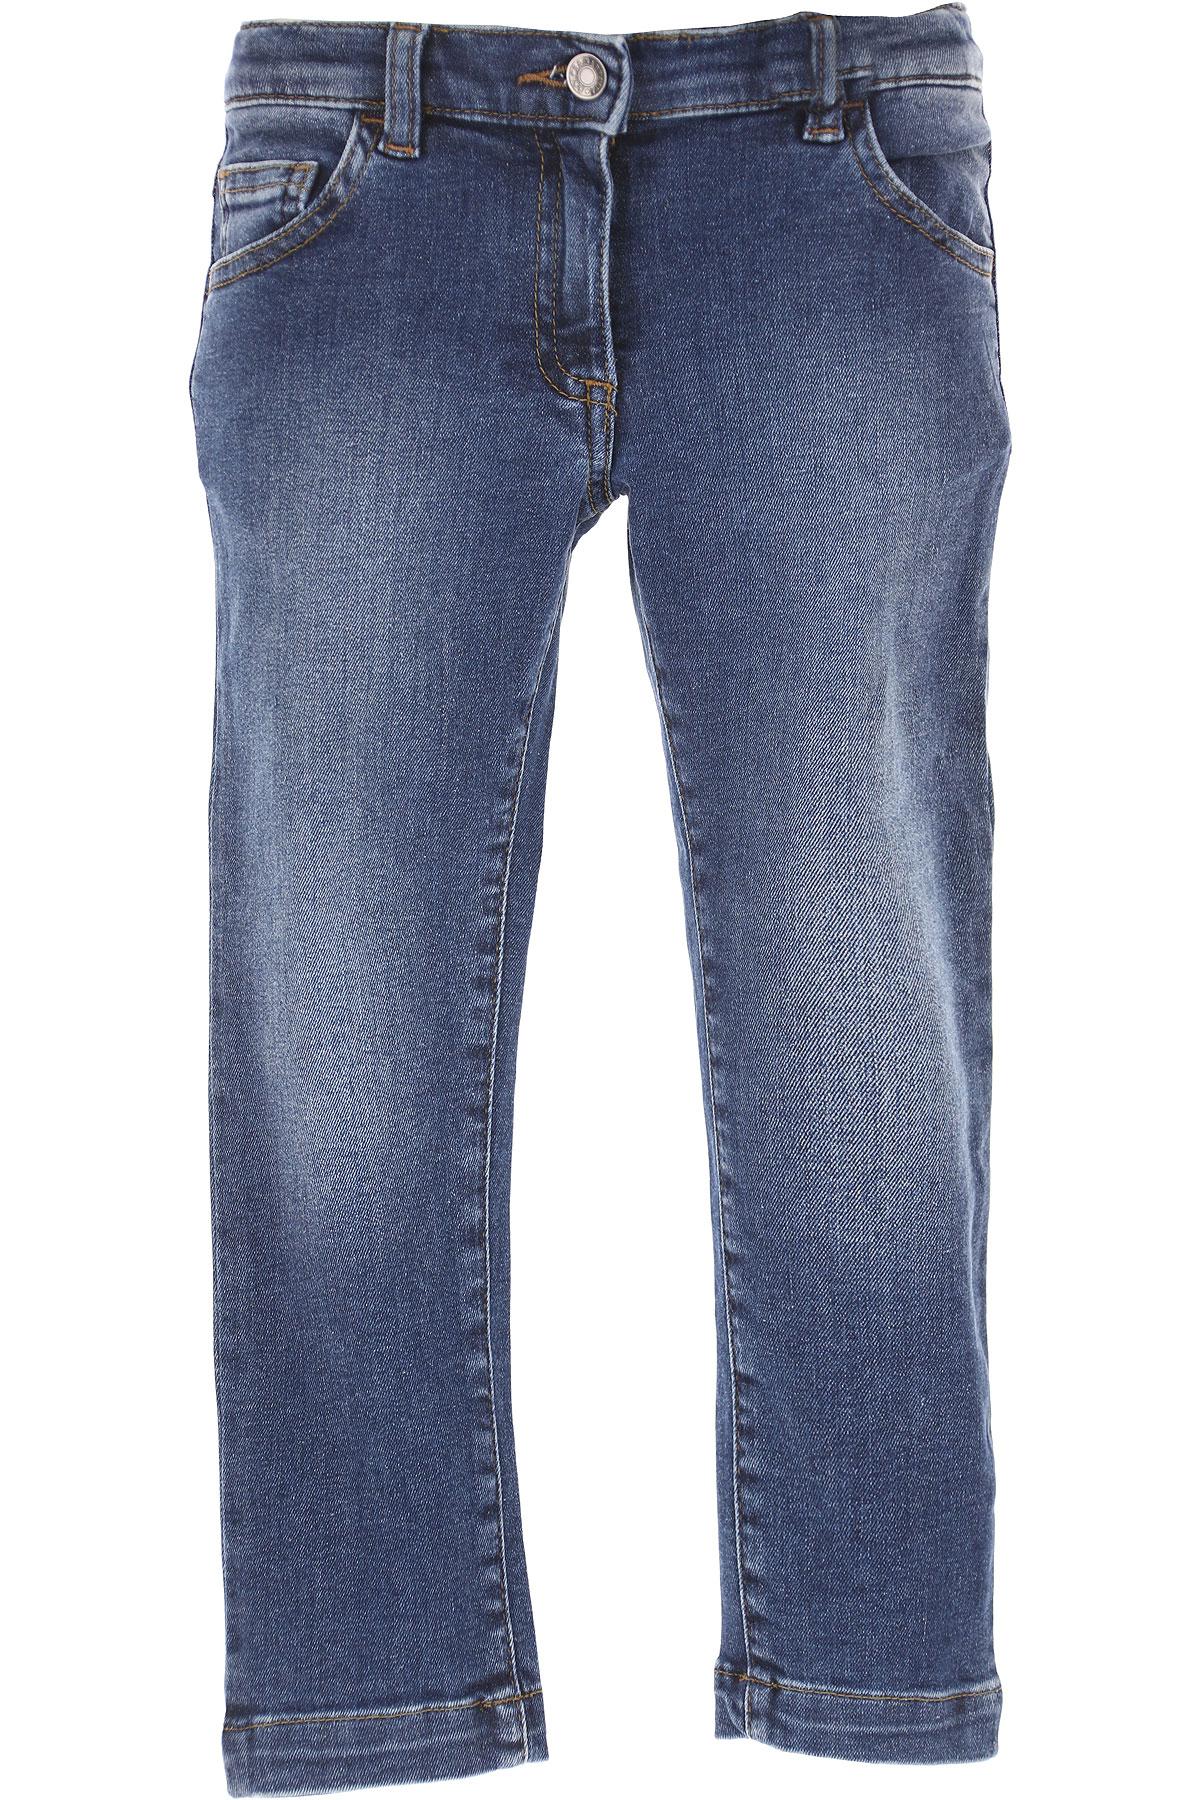 Dolce & Gabbana Kids Jeans for Girls On Sale in Outlet, Denim, Cotton, 2017, 10Y 4Y 6Y